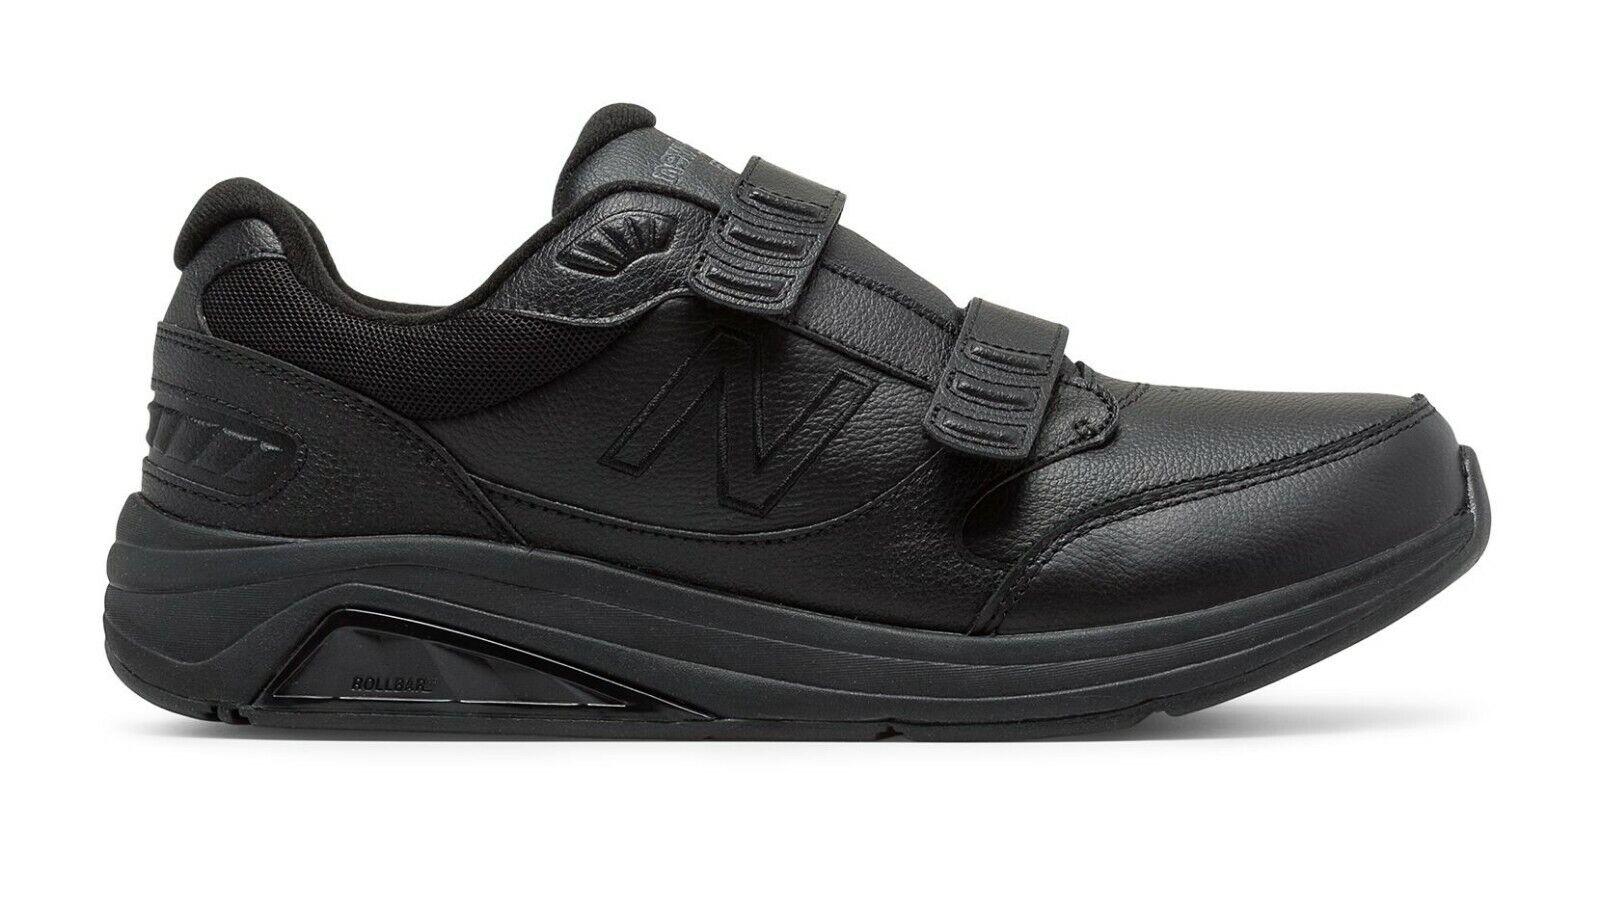 Men's NEW BALANCE 928v3 WALKING SNEAKERS Sz 16 2E Velcro Bla